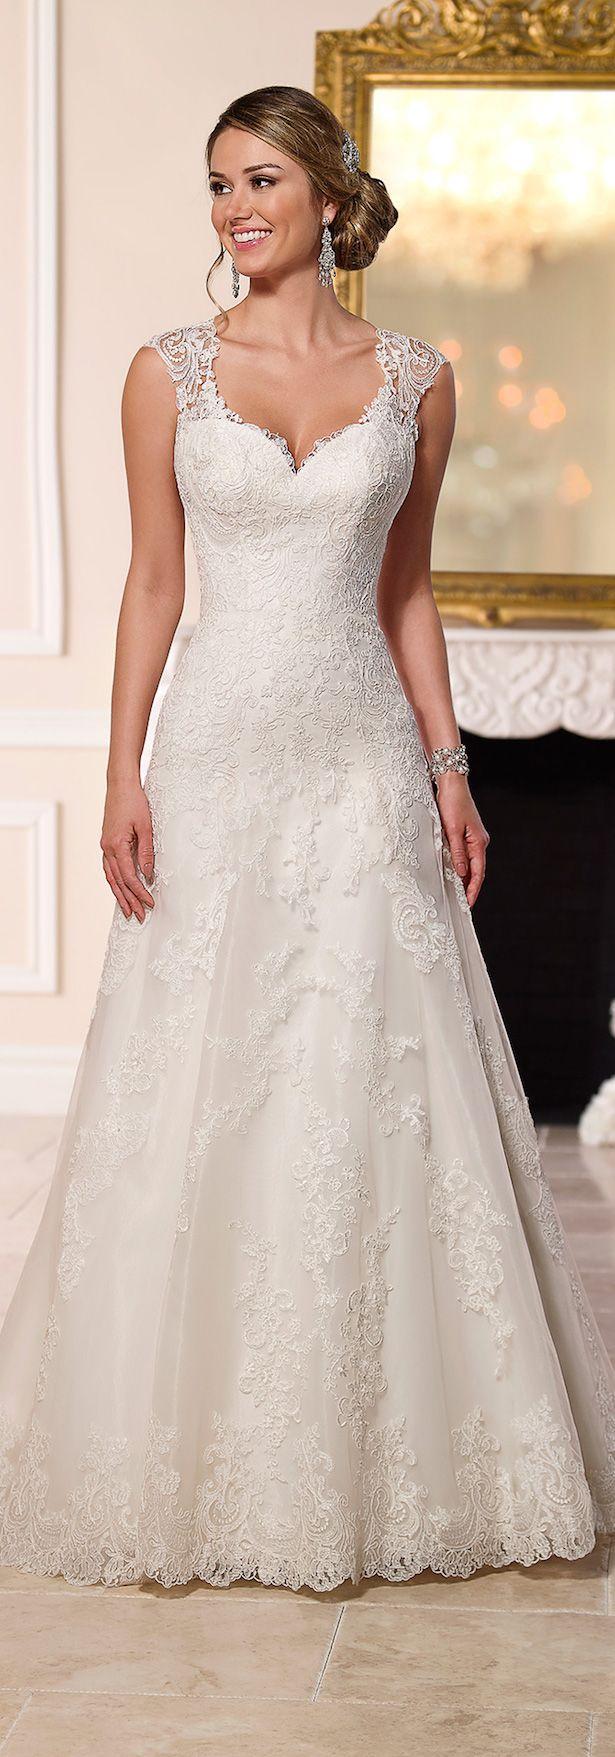 Spring york stella wedding dress